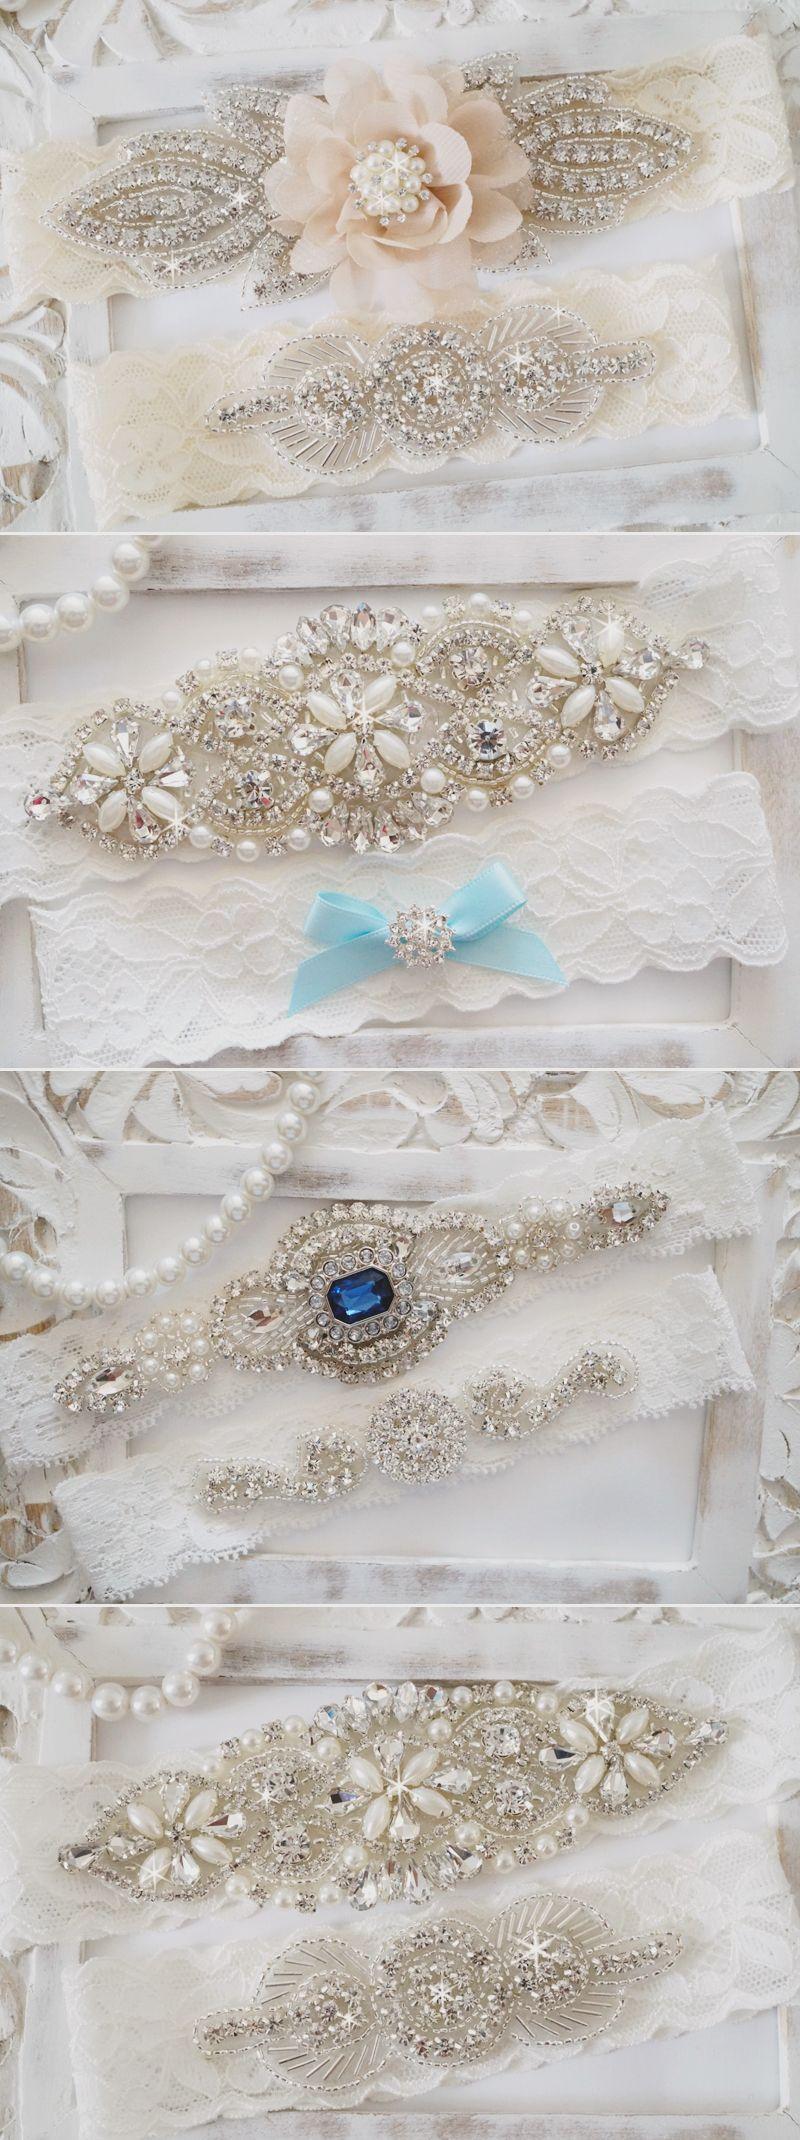 37 utterly romantic wedding garters you'll love | wedding garter